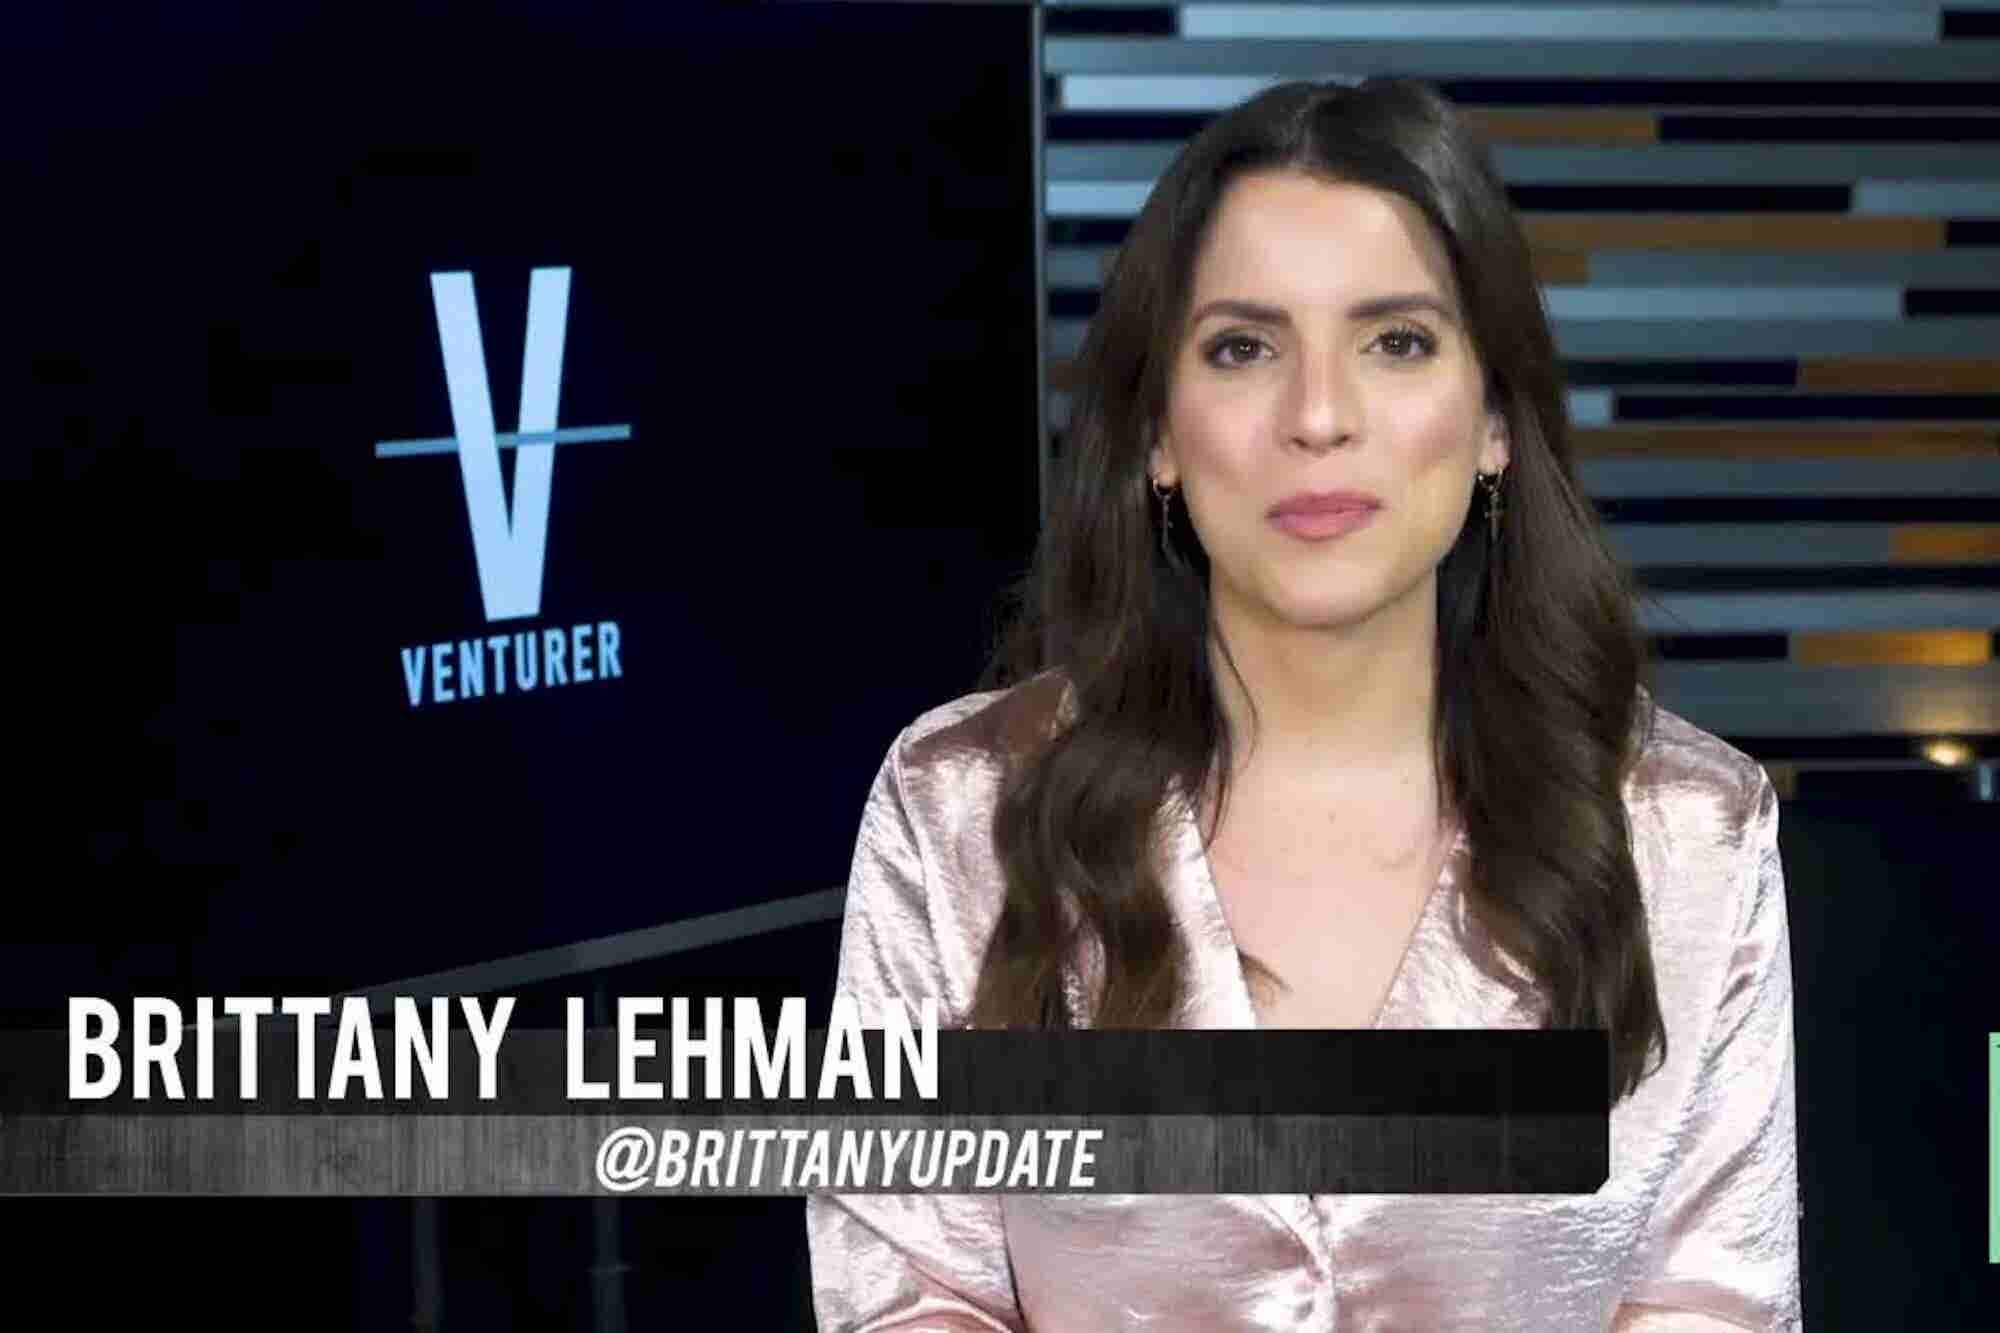 Rental Space Startup Blueground Raises $20 Million